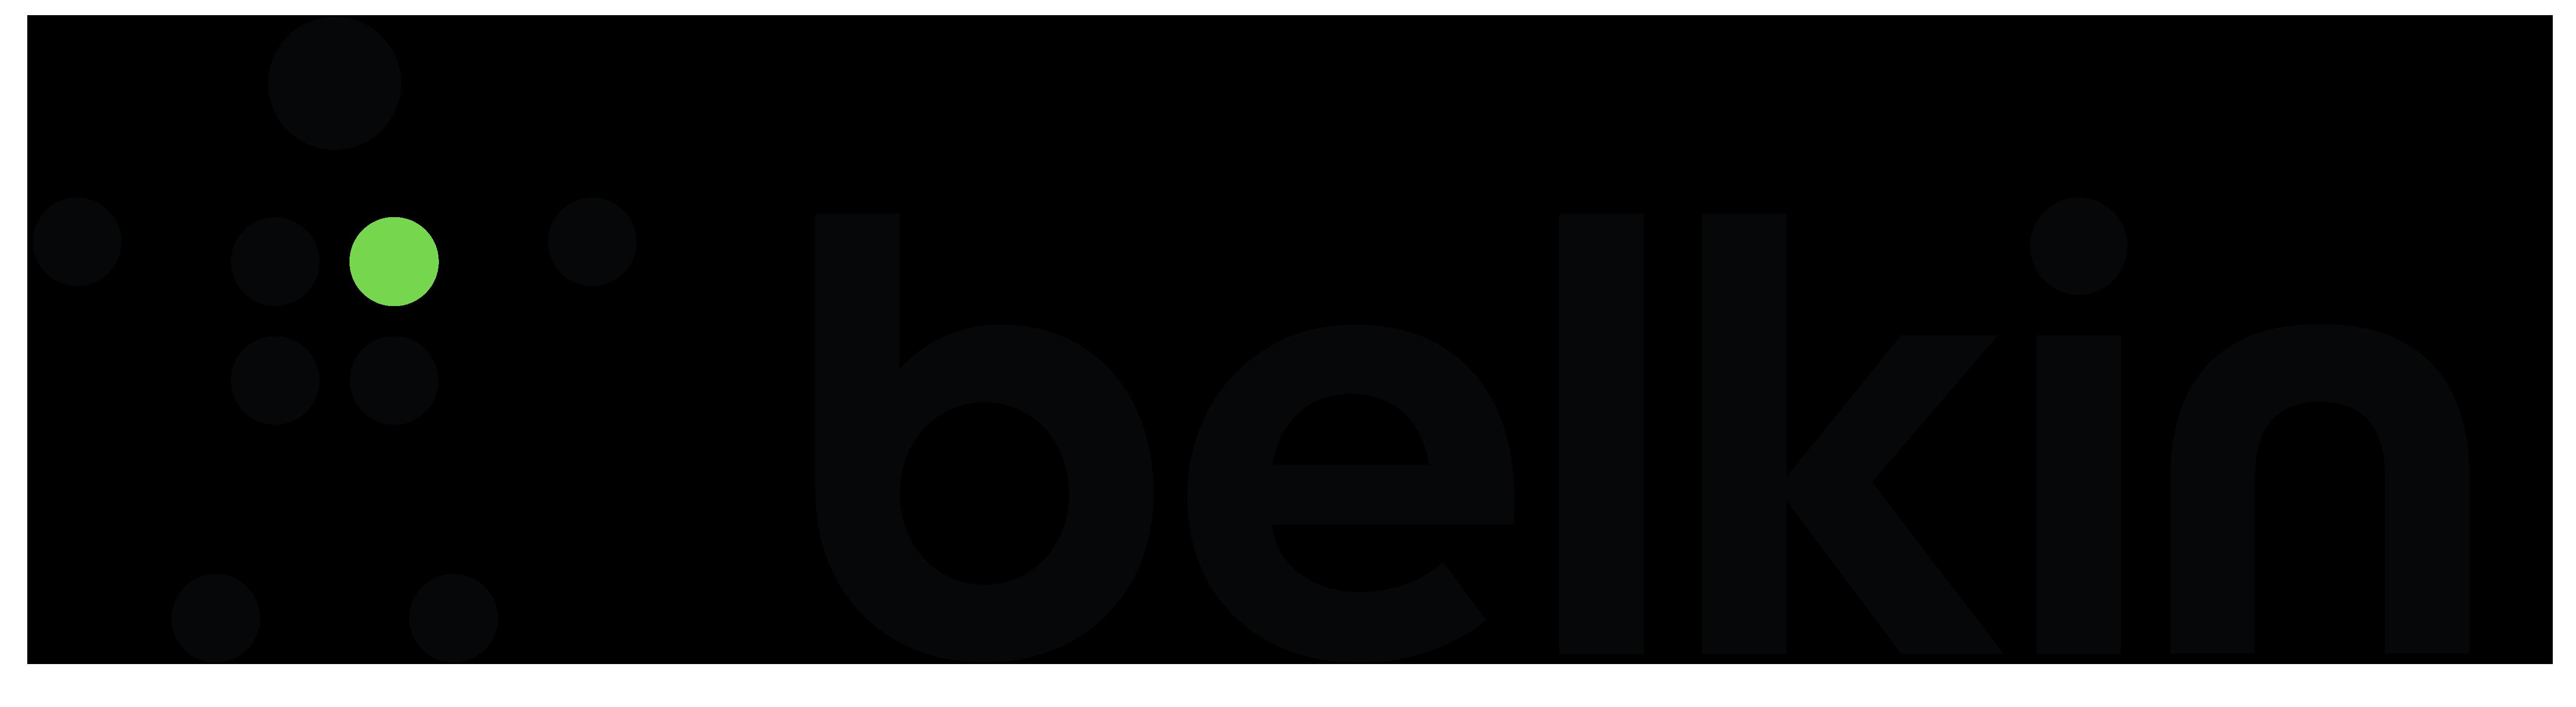 belkin � logos download